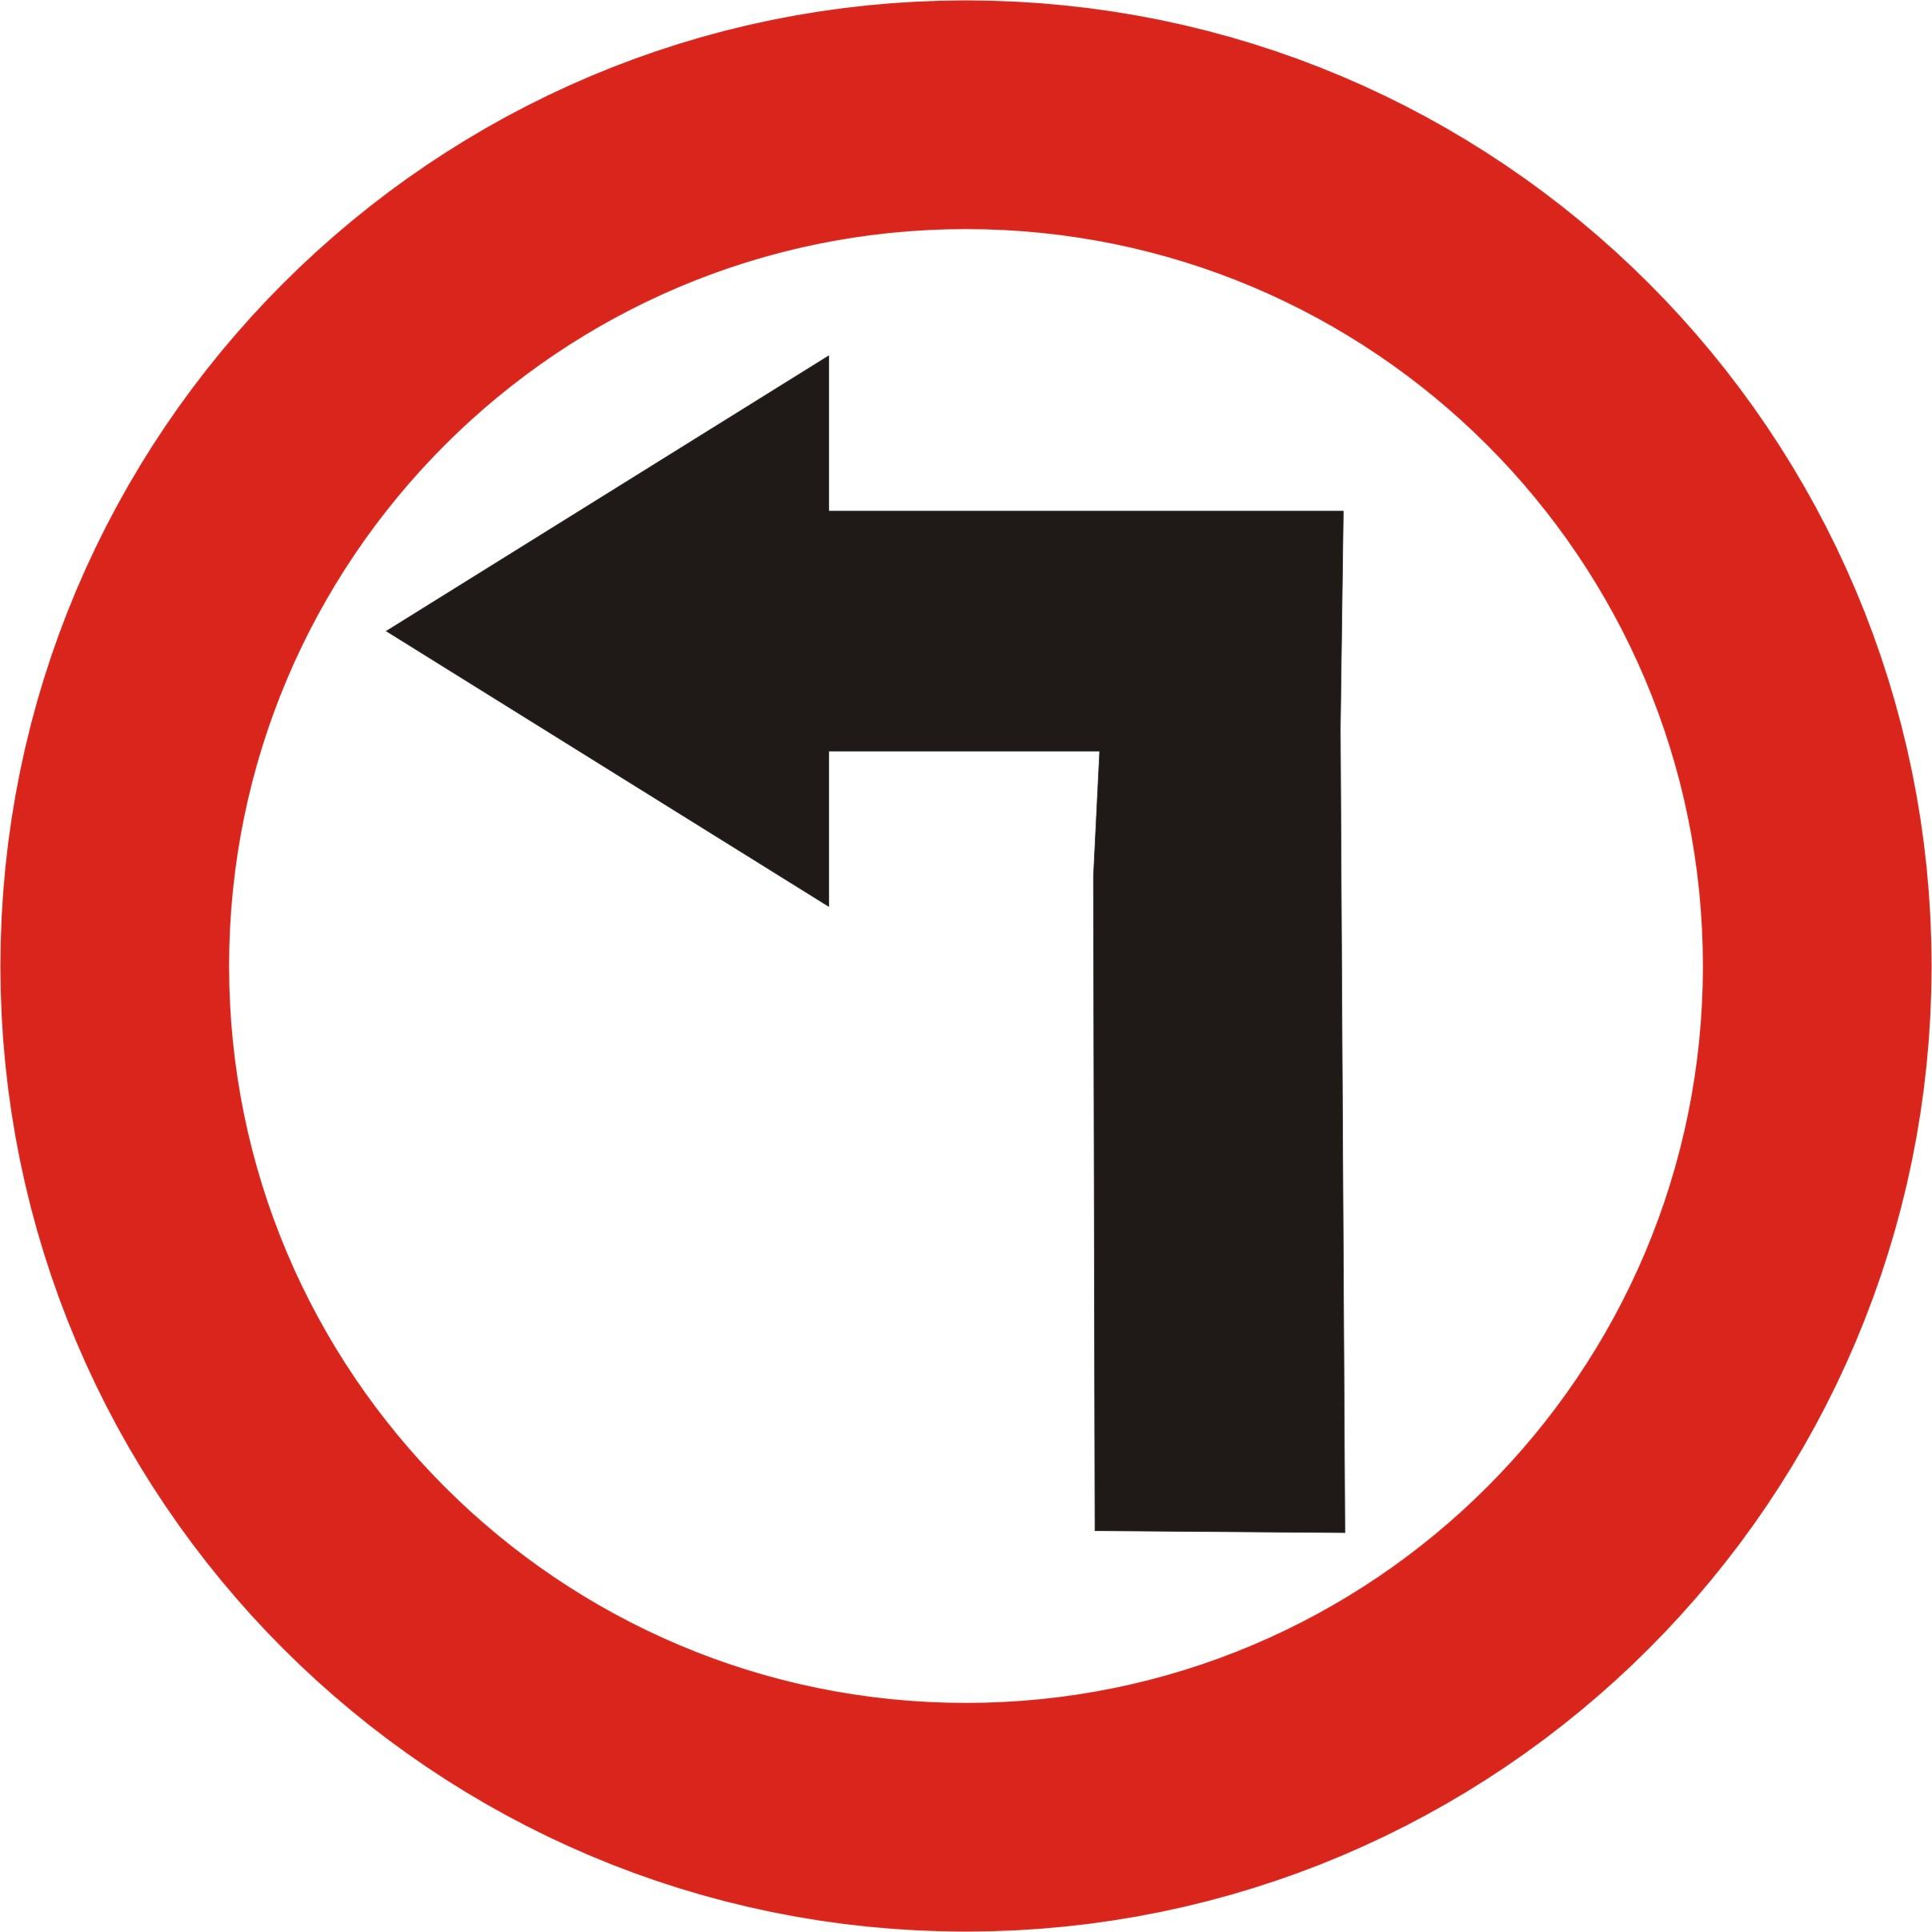 file road sign left turn jpg wikimedia commons